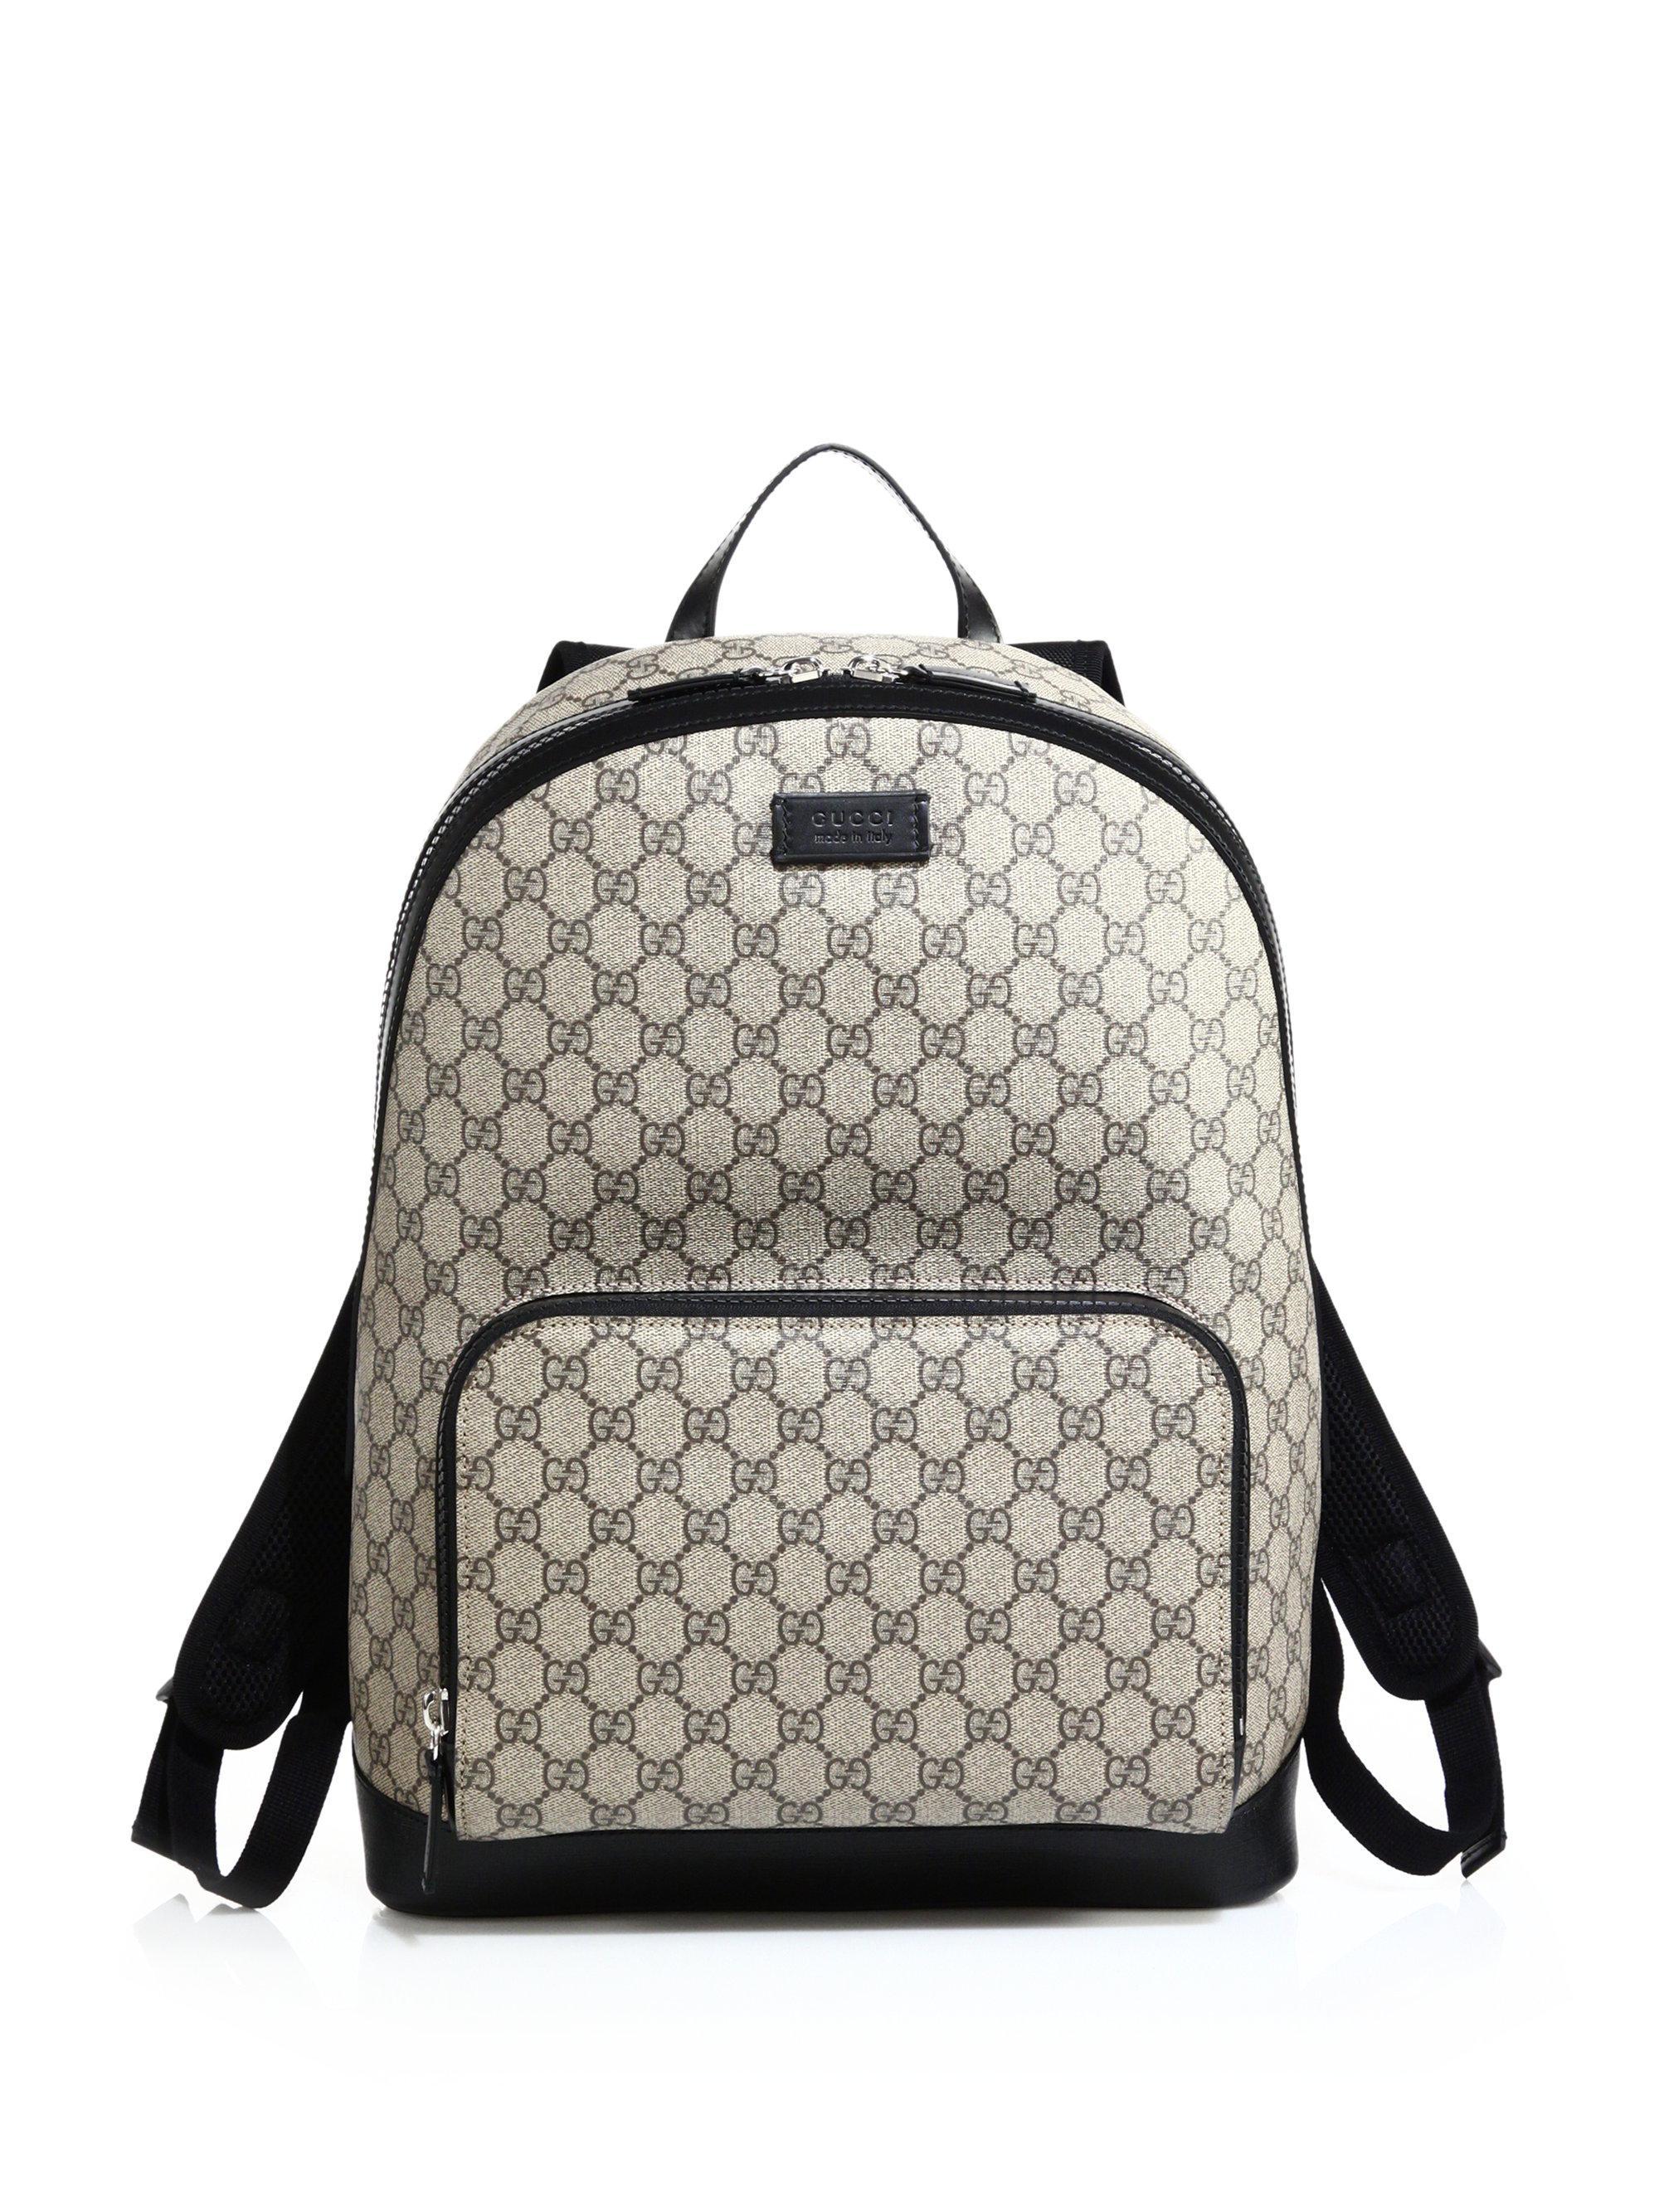 c861c9a815b Gg Supreme Canvas Backpack Beige - Motorslist